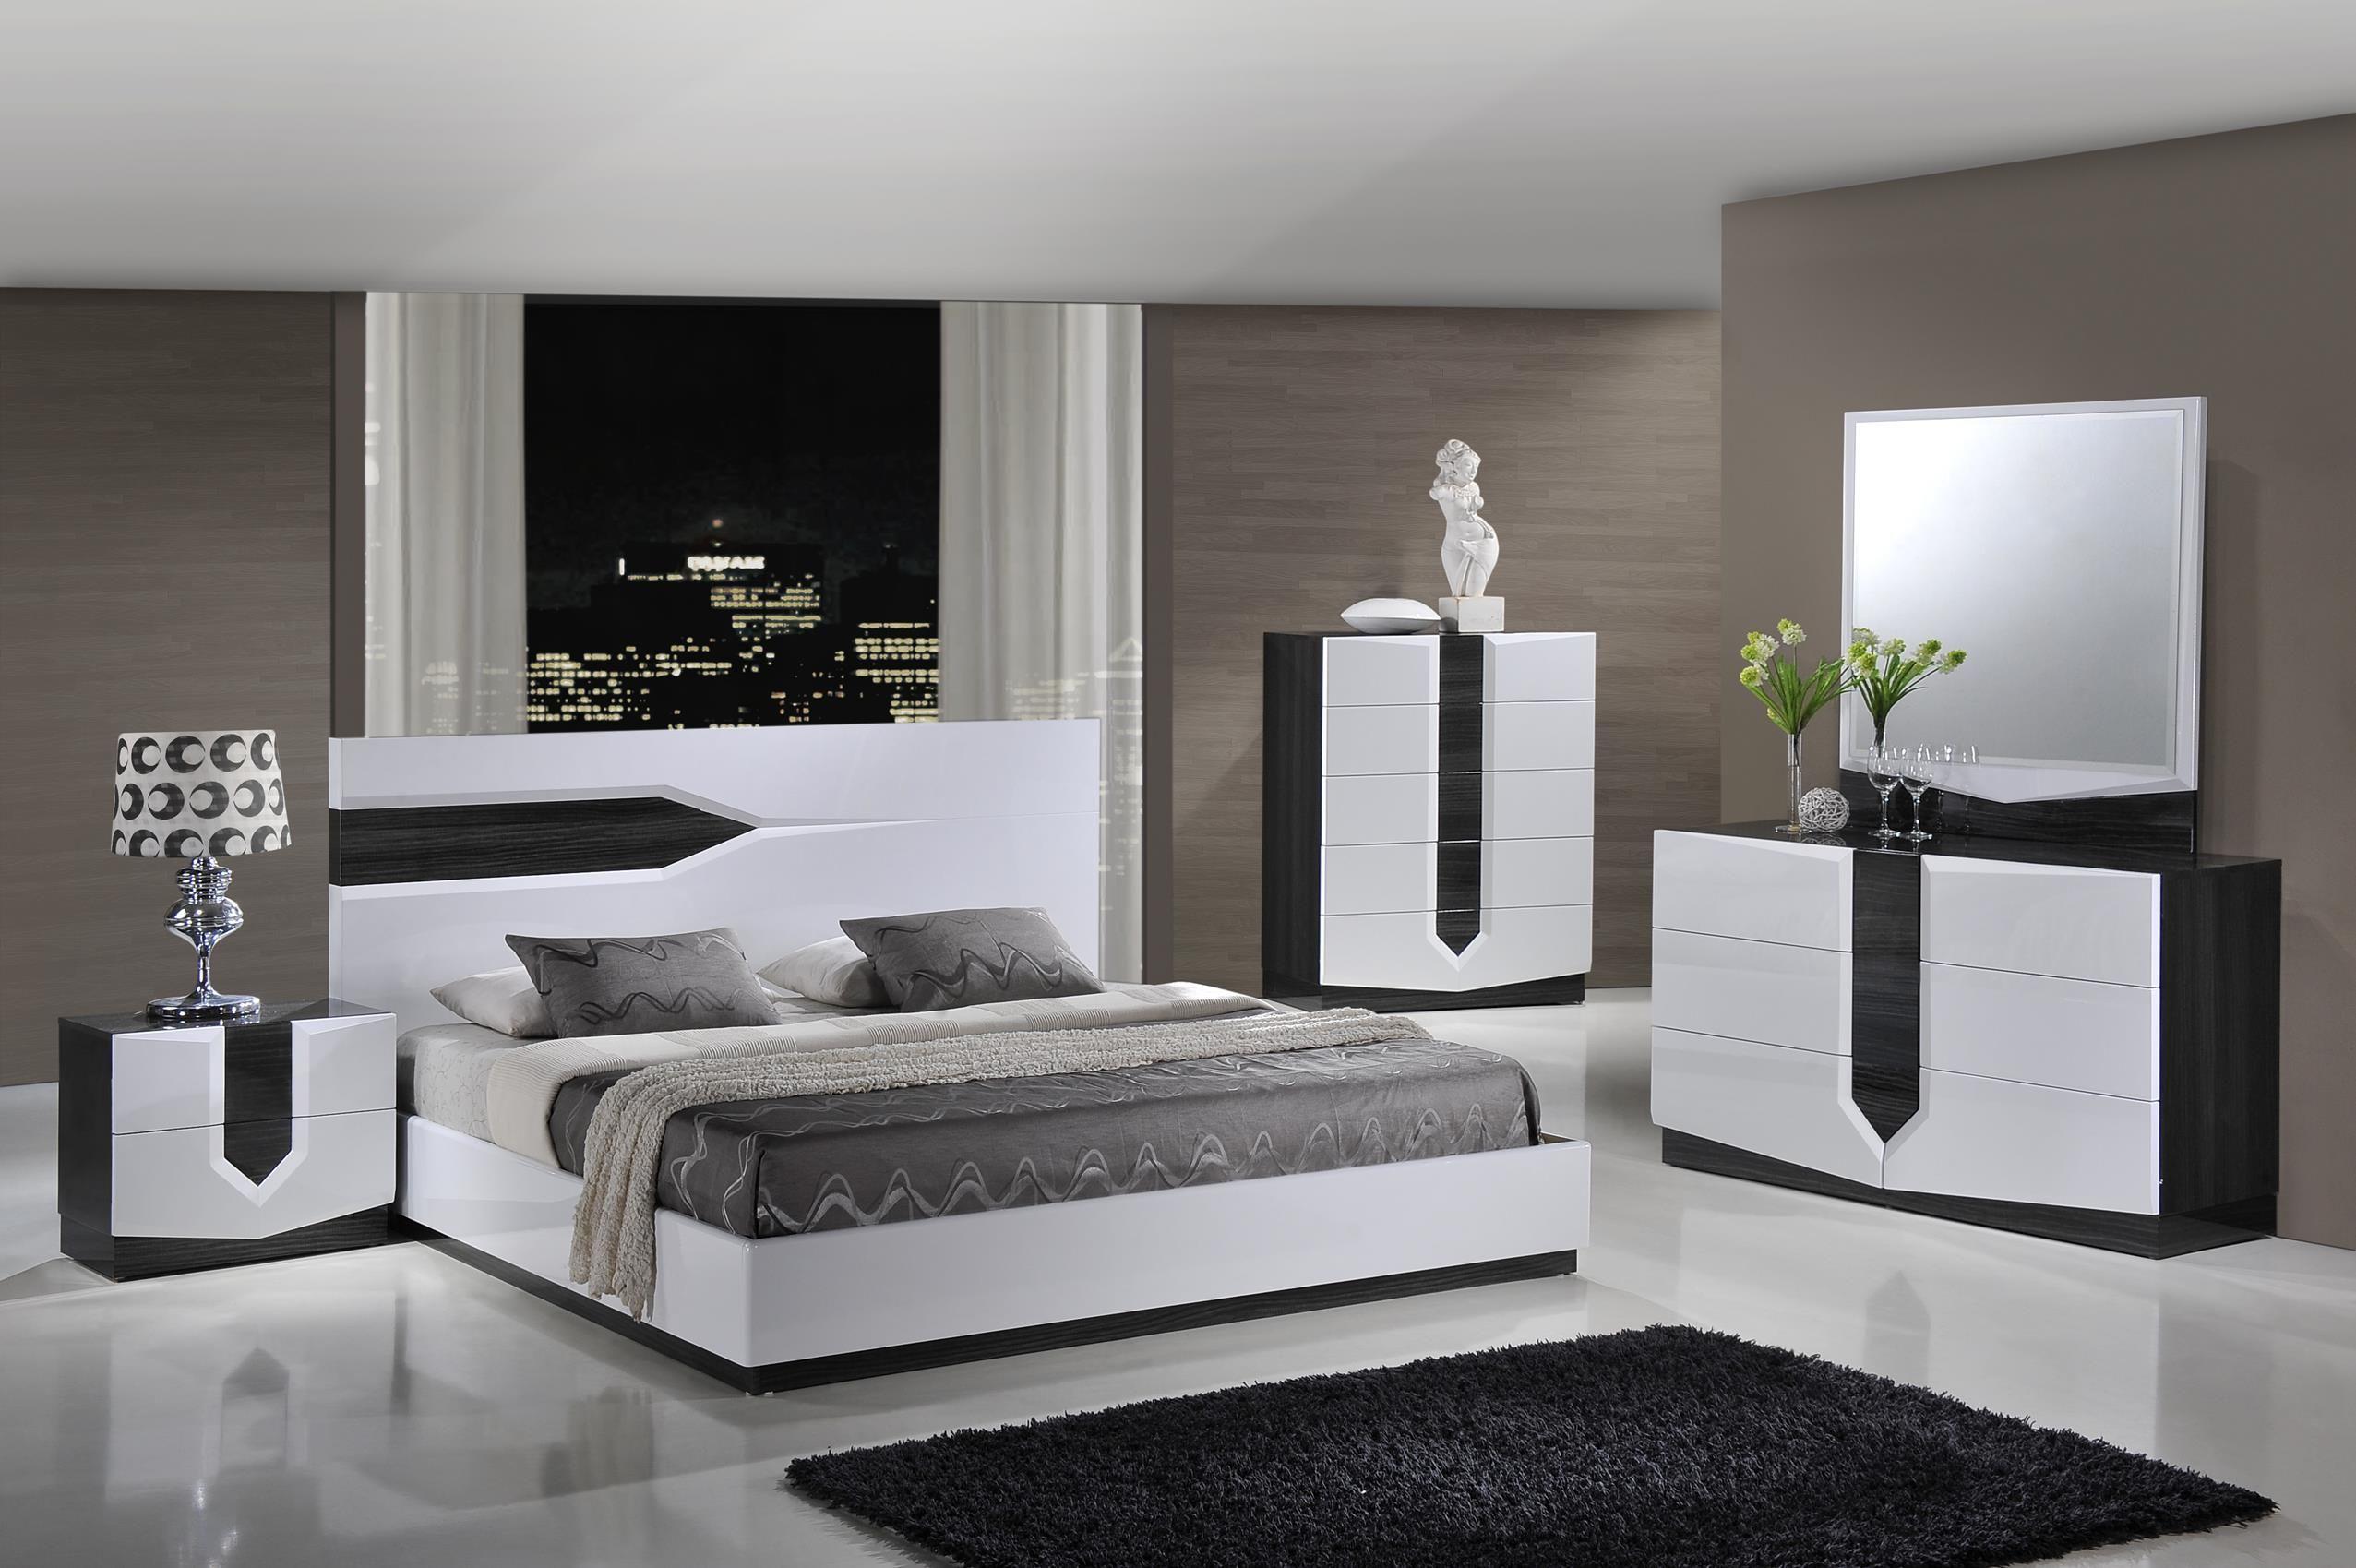 Metropolitan Sideboard Exclusive Furniture  Monochrome Bedroom Unique Bedroom Furniture In Houston Review